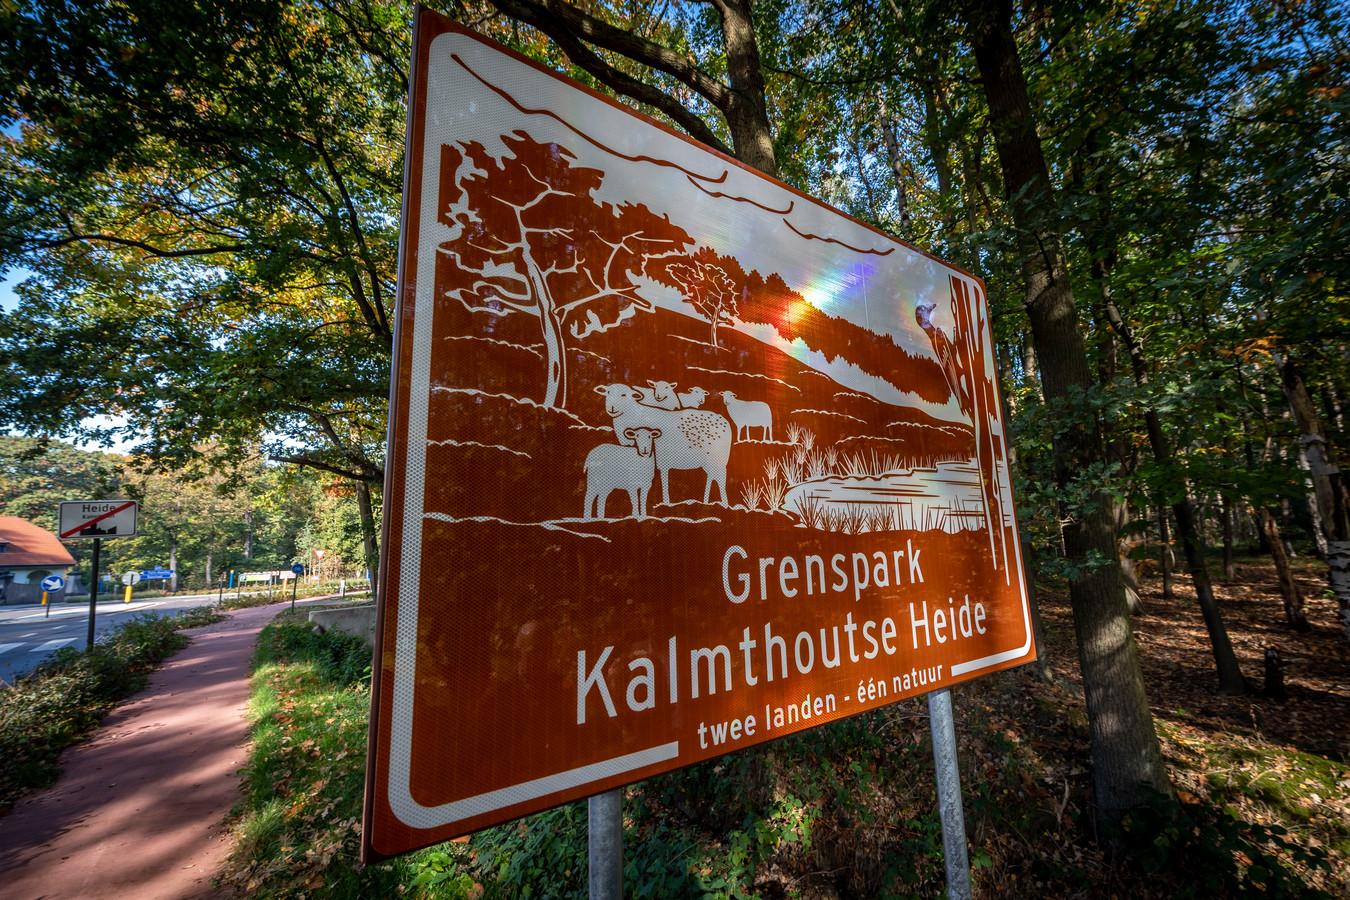 Het promobord bij Grenspark Kalmthoutse Heide.